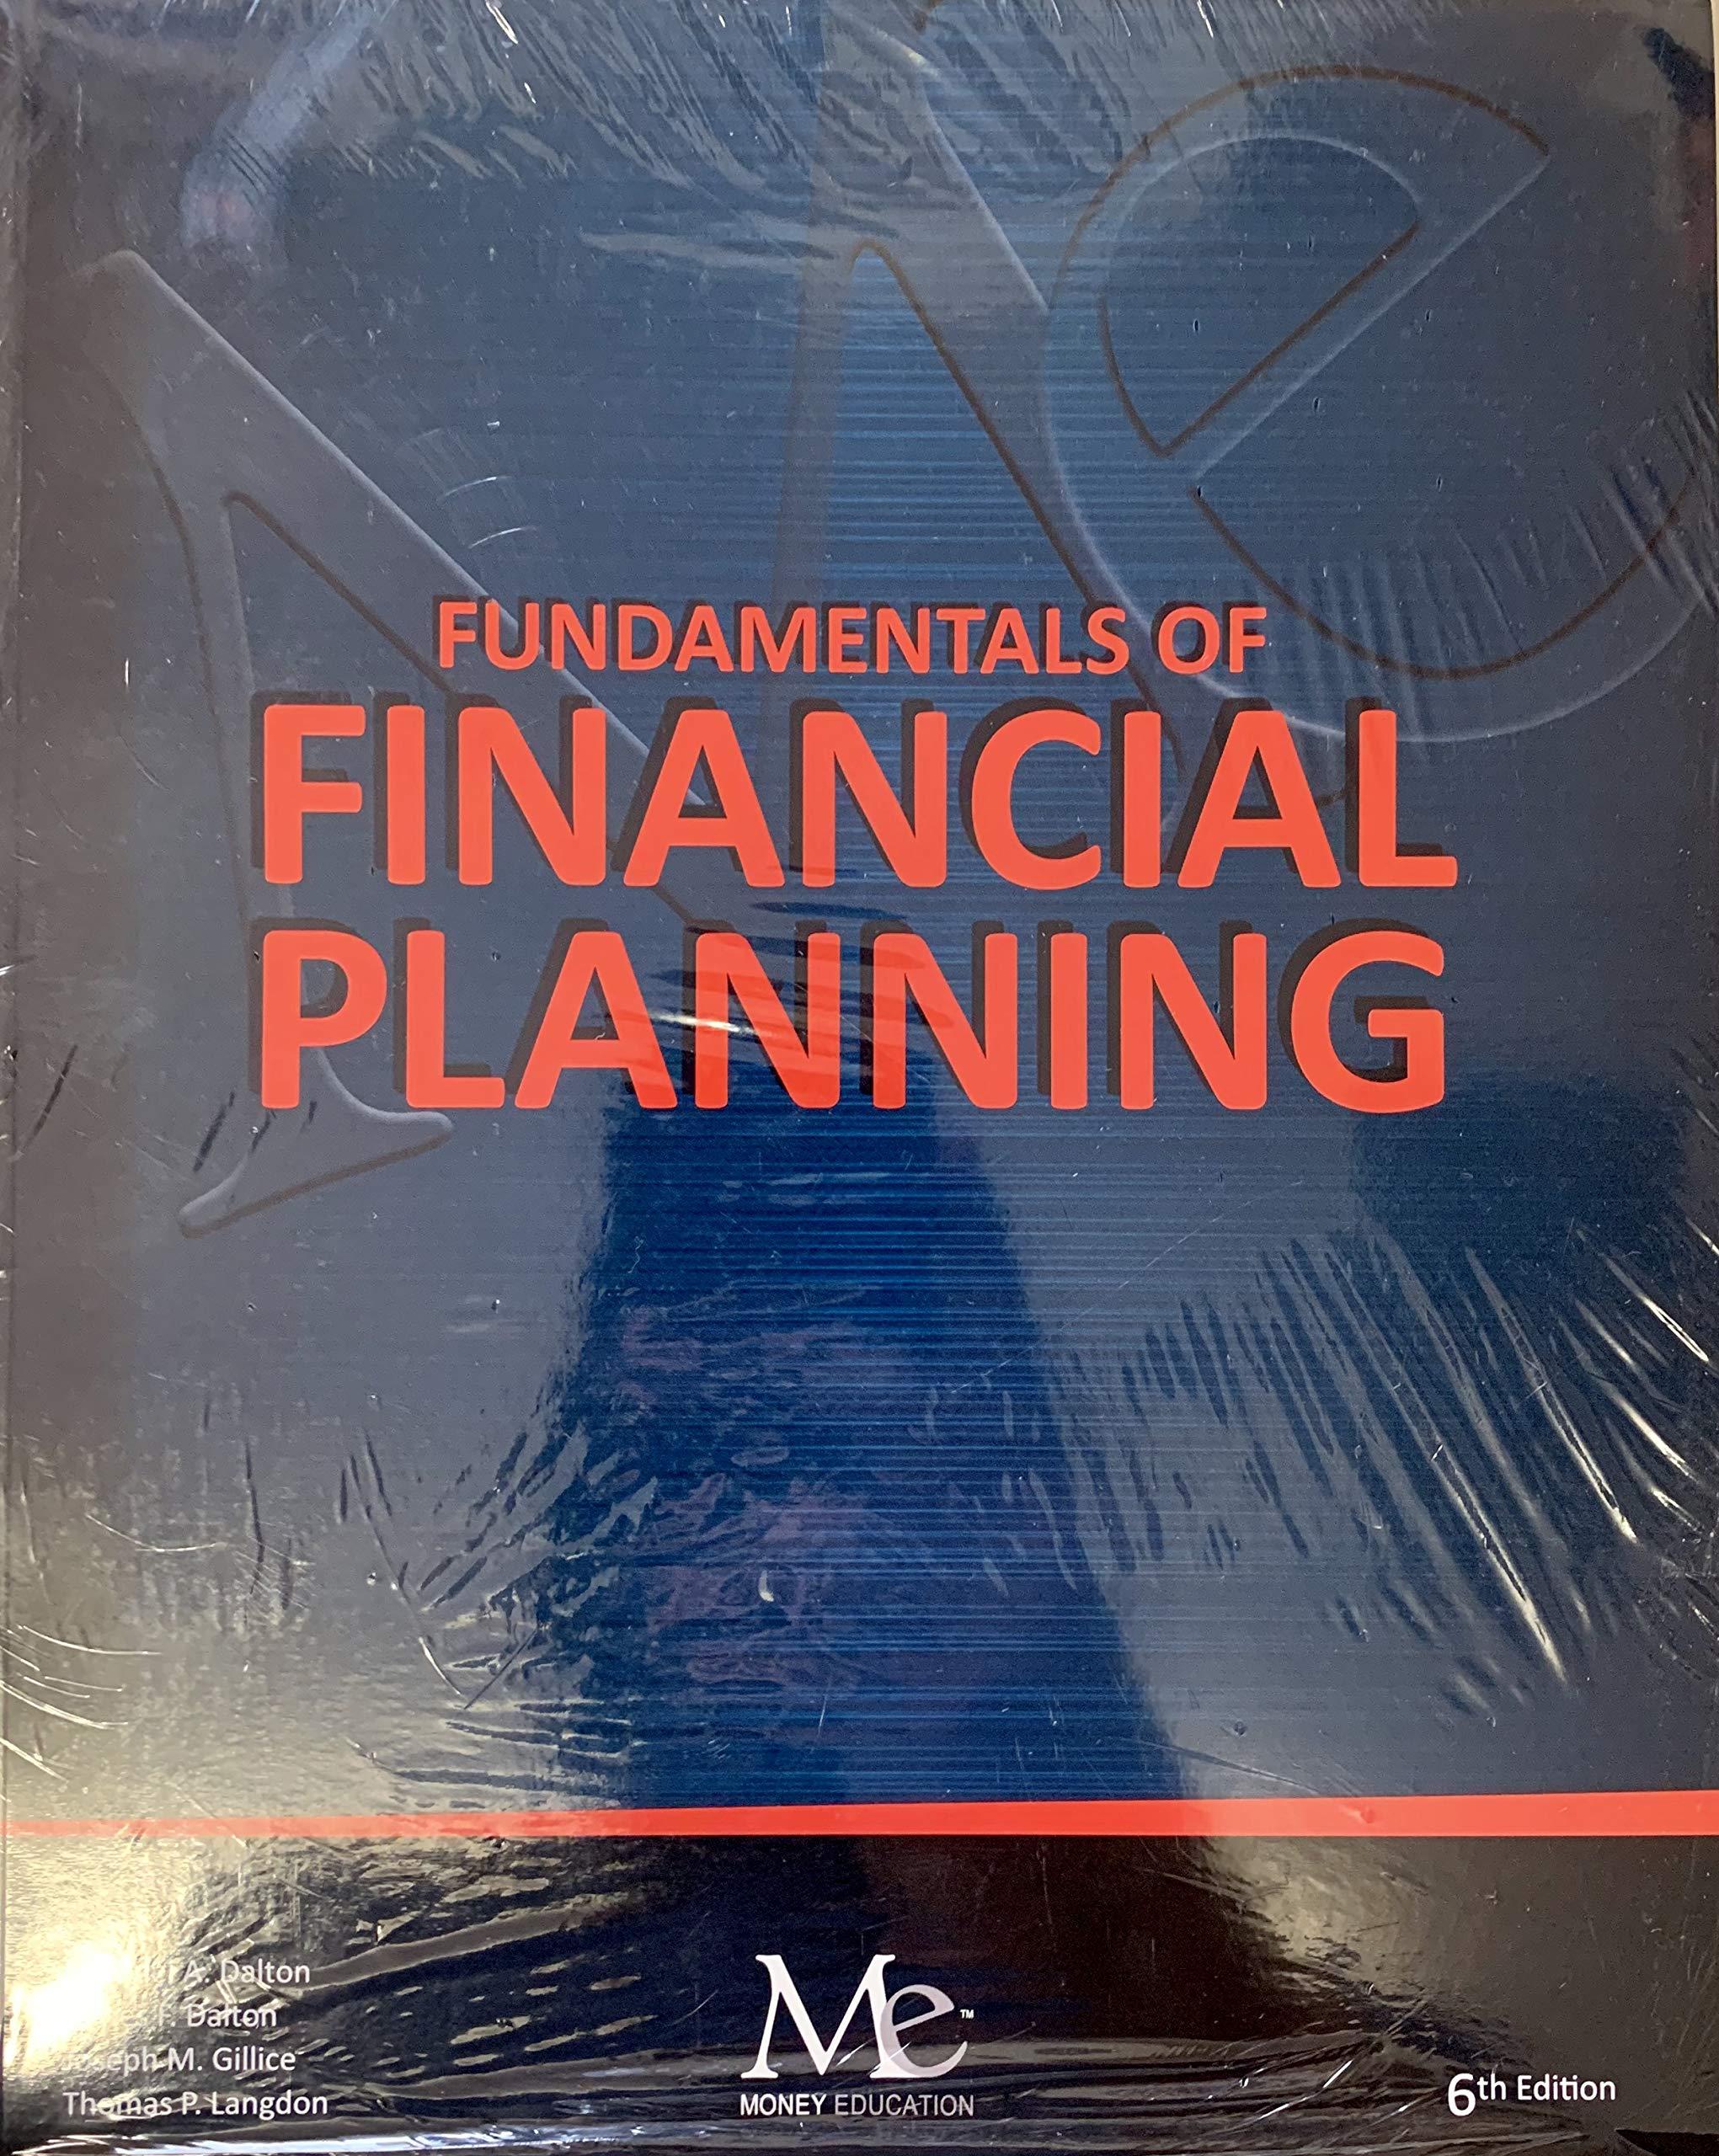 Fundamentals Of Financial Planning Buy Online In Aruba At Aruba Desertcart Com Productid 186718746